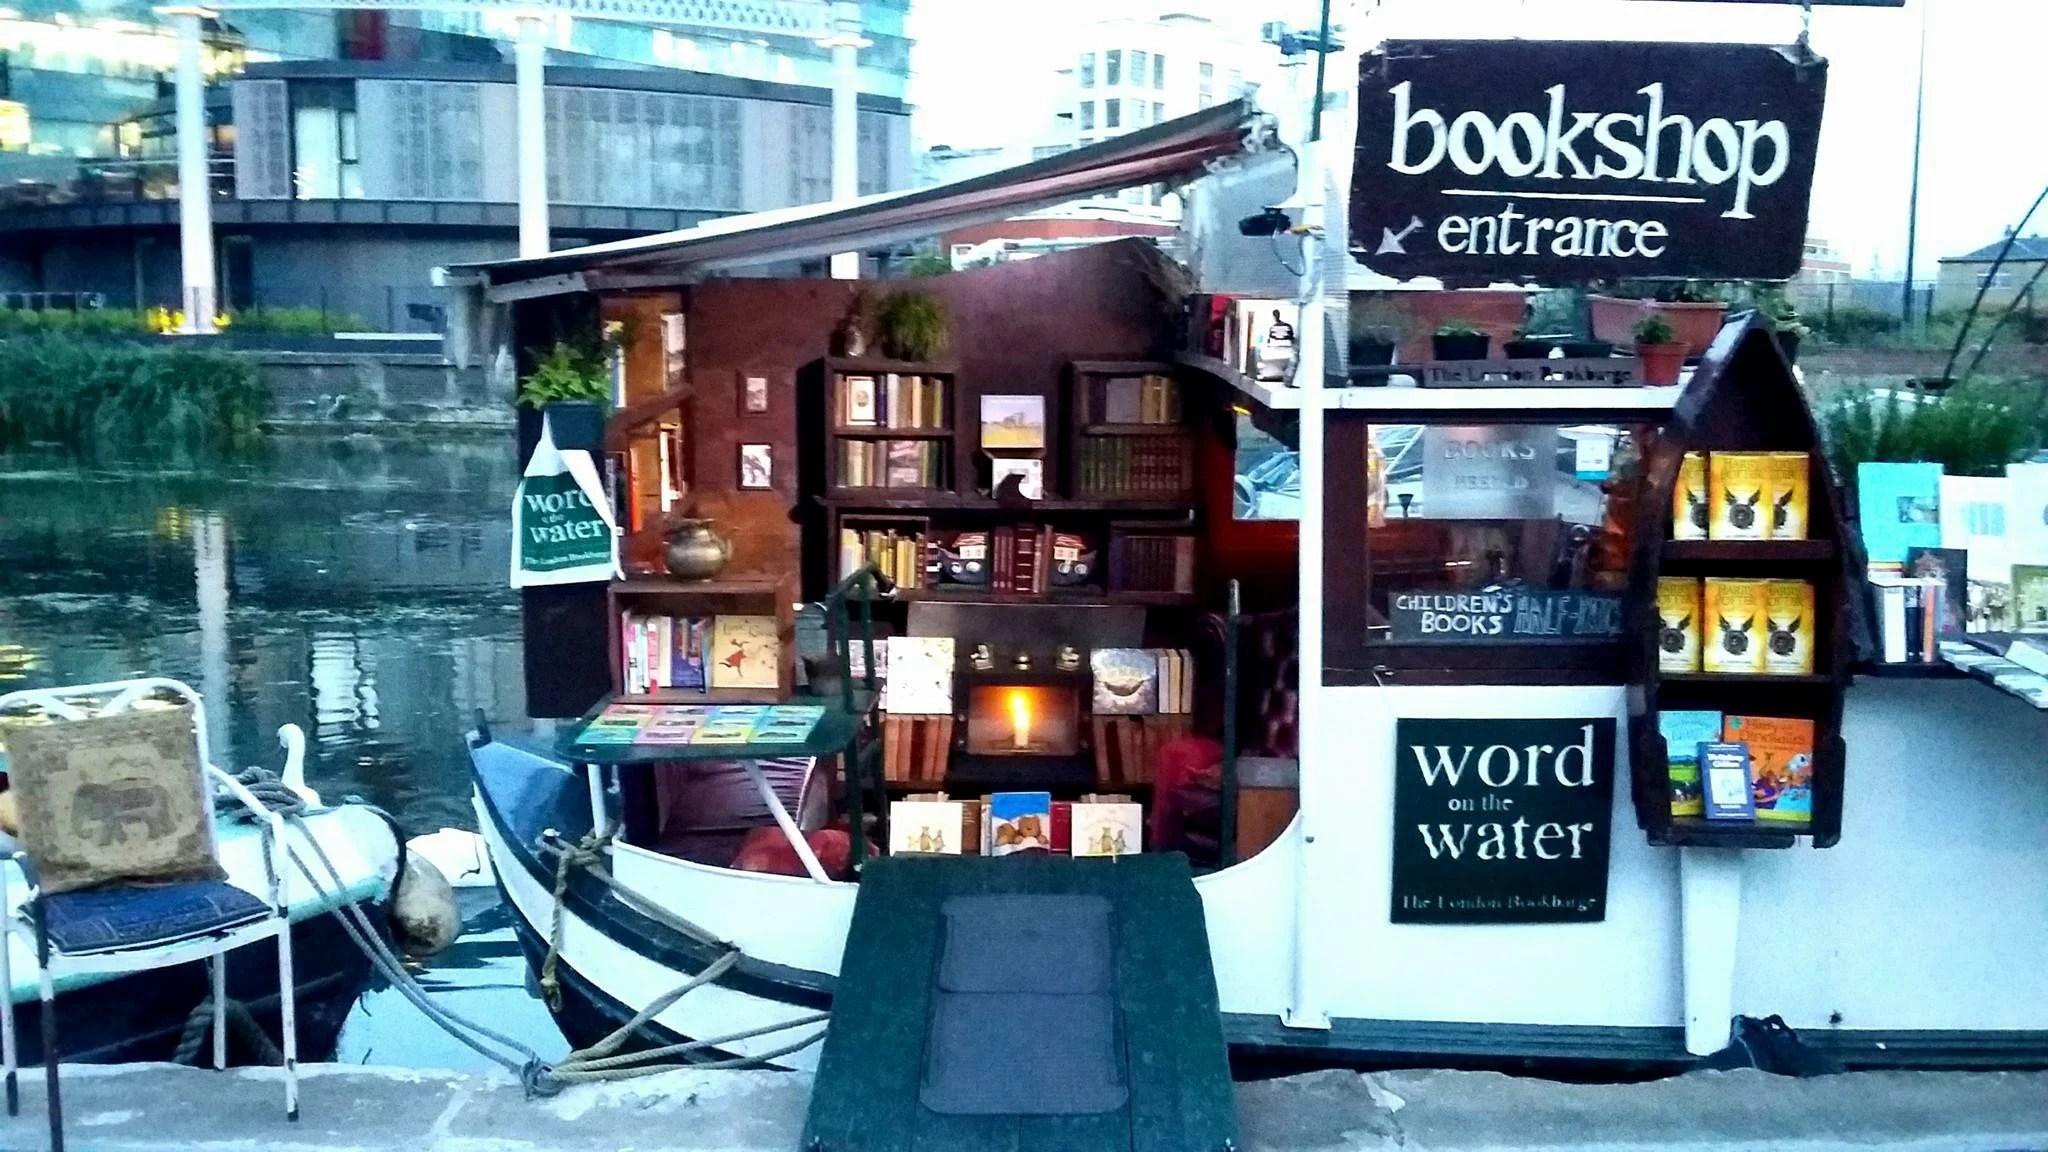 books_wordonthewater